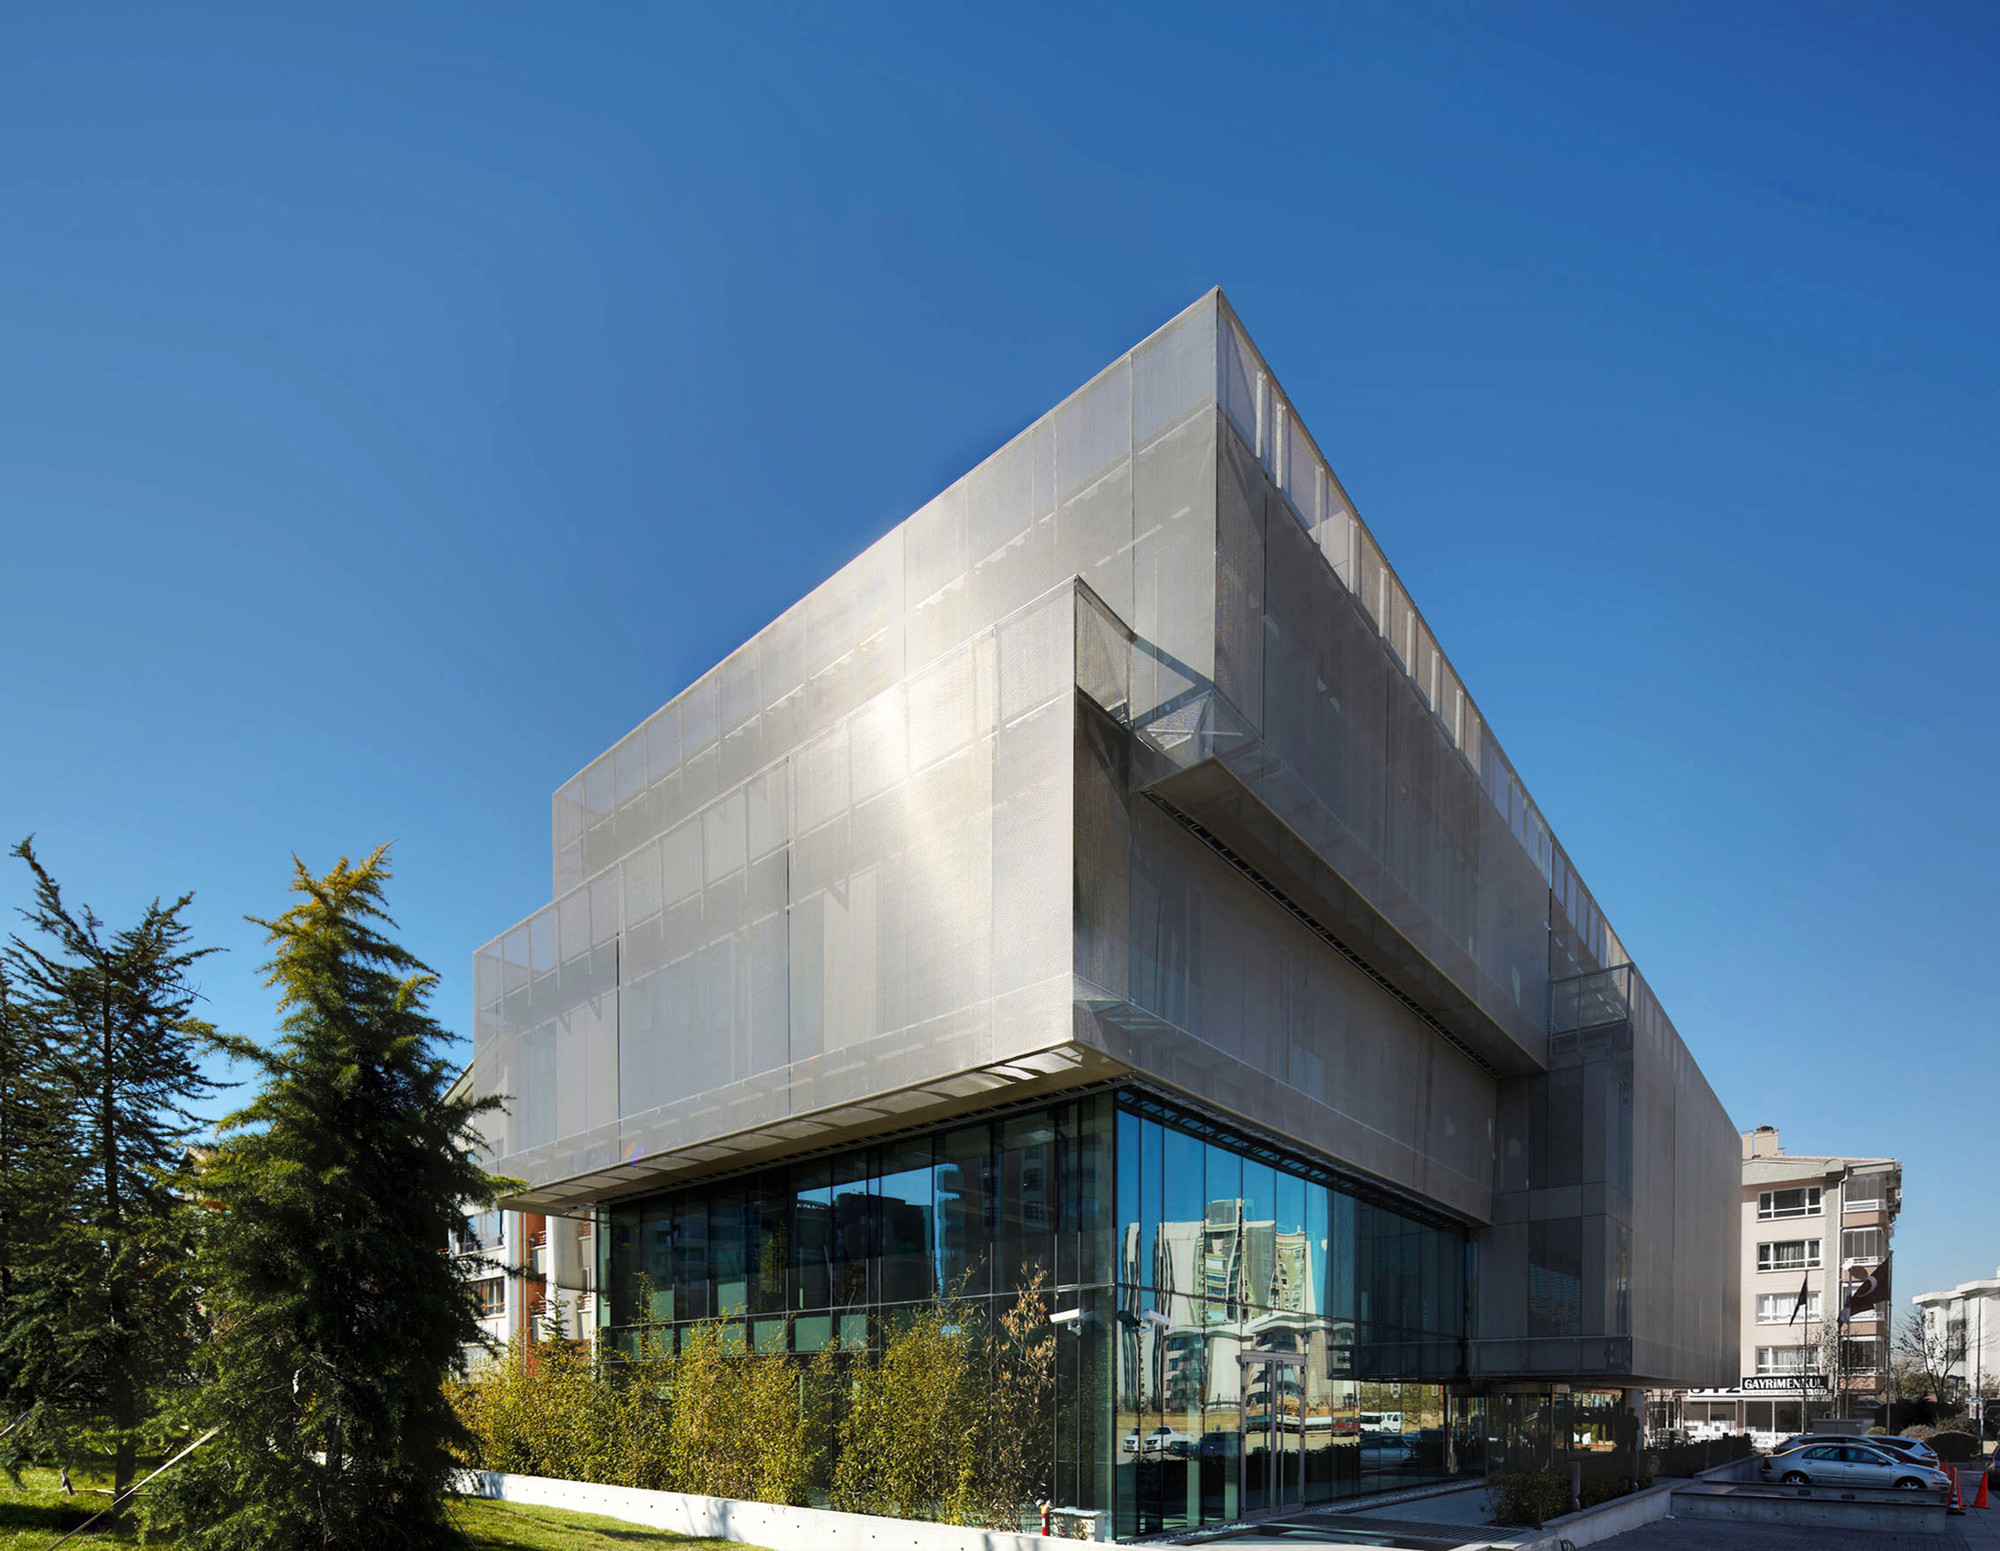 Turkish Contractor's Associaton HQ  / AVCI Architects , © Yunus Özkazanç